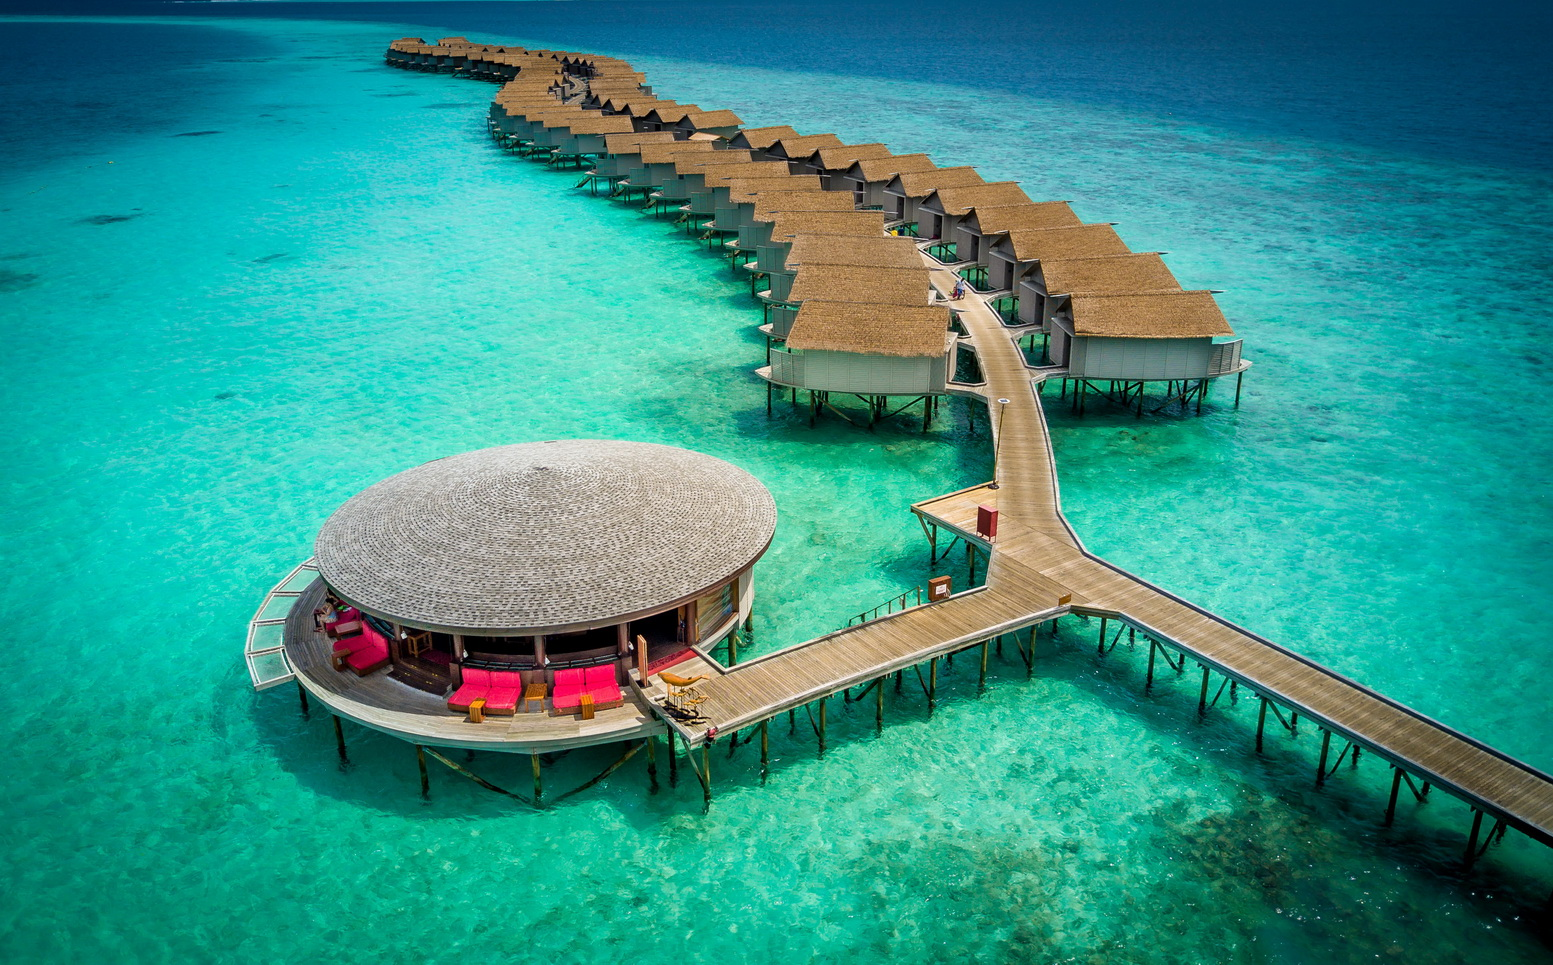 Centara Ras Fushi Resort & Spa Maldives (เซ็นทารา ราส ฟูชิ รีสอร์ทแอนด์สปา มัลดีฟส์) ช่วงสงกรานต์ รวมตั๋วเครื่องบิน ราคาเริ่มต้น 40,500 บาท เหมาะสำหรับสายดำน้ำและความสงบส่วนตัว